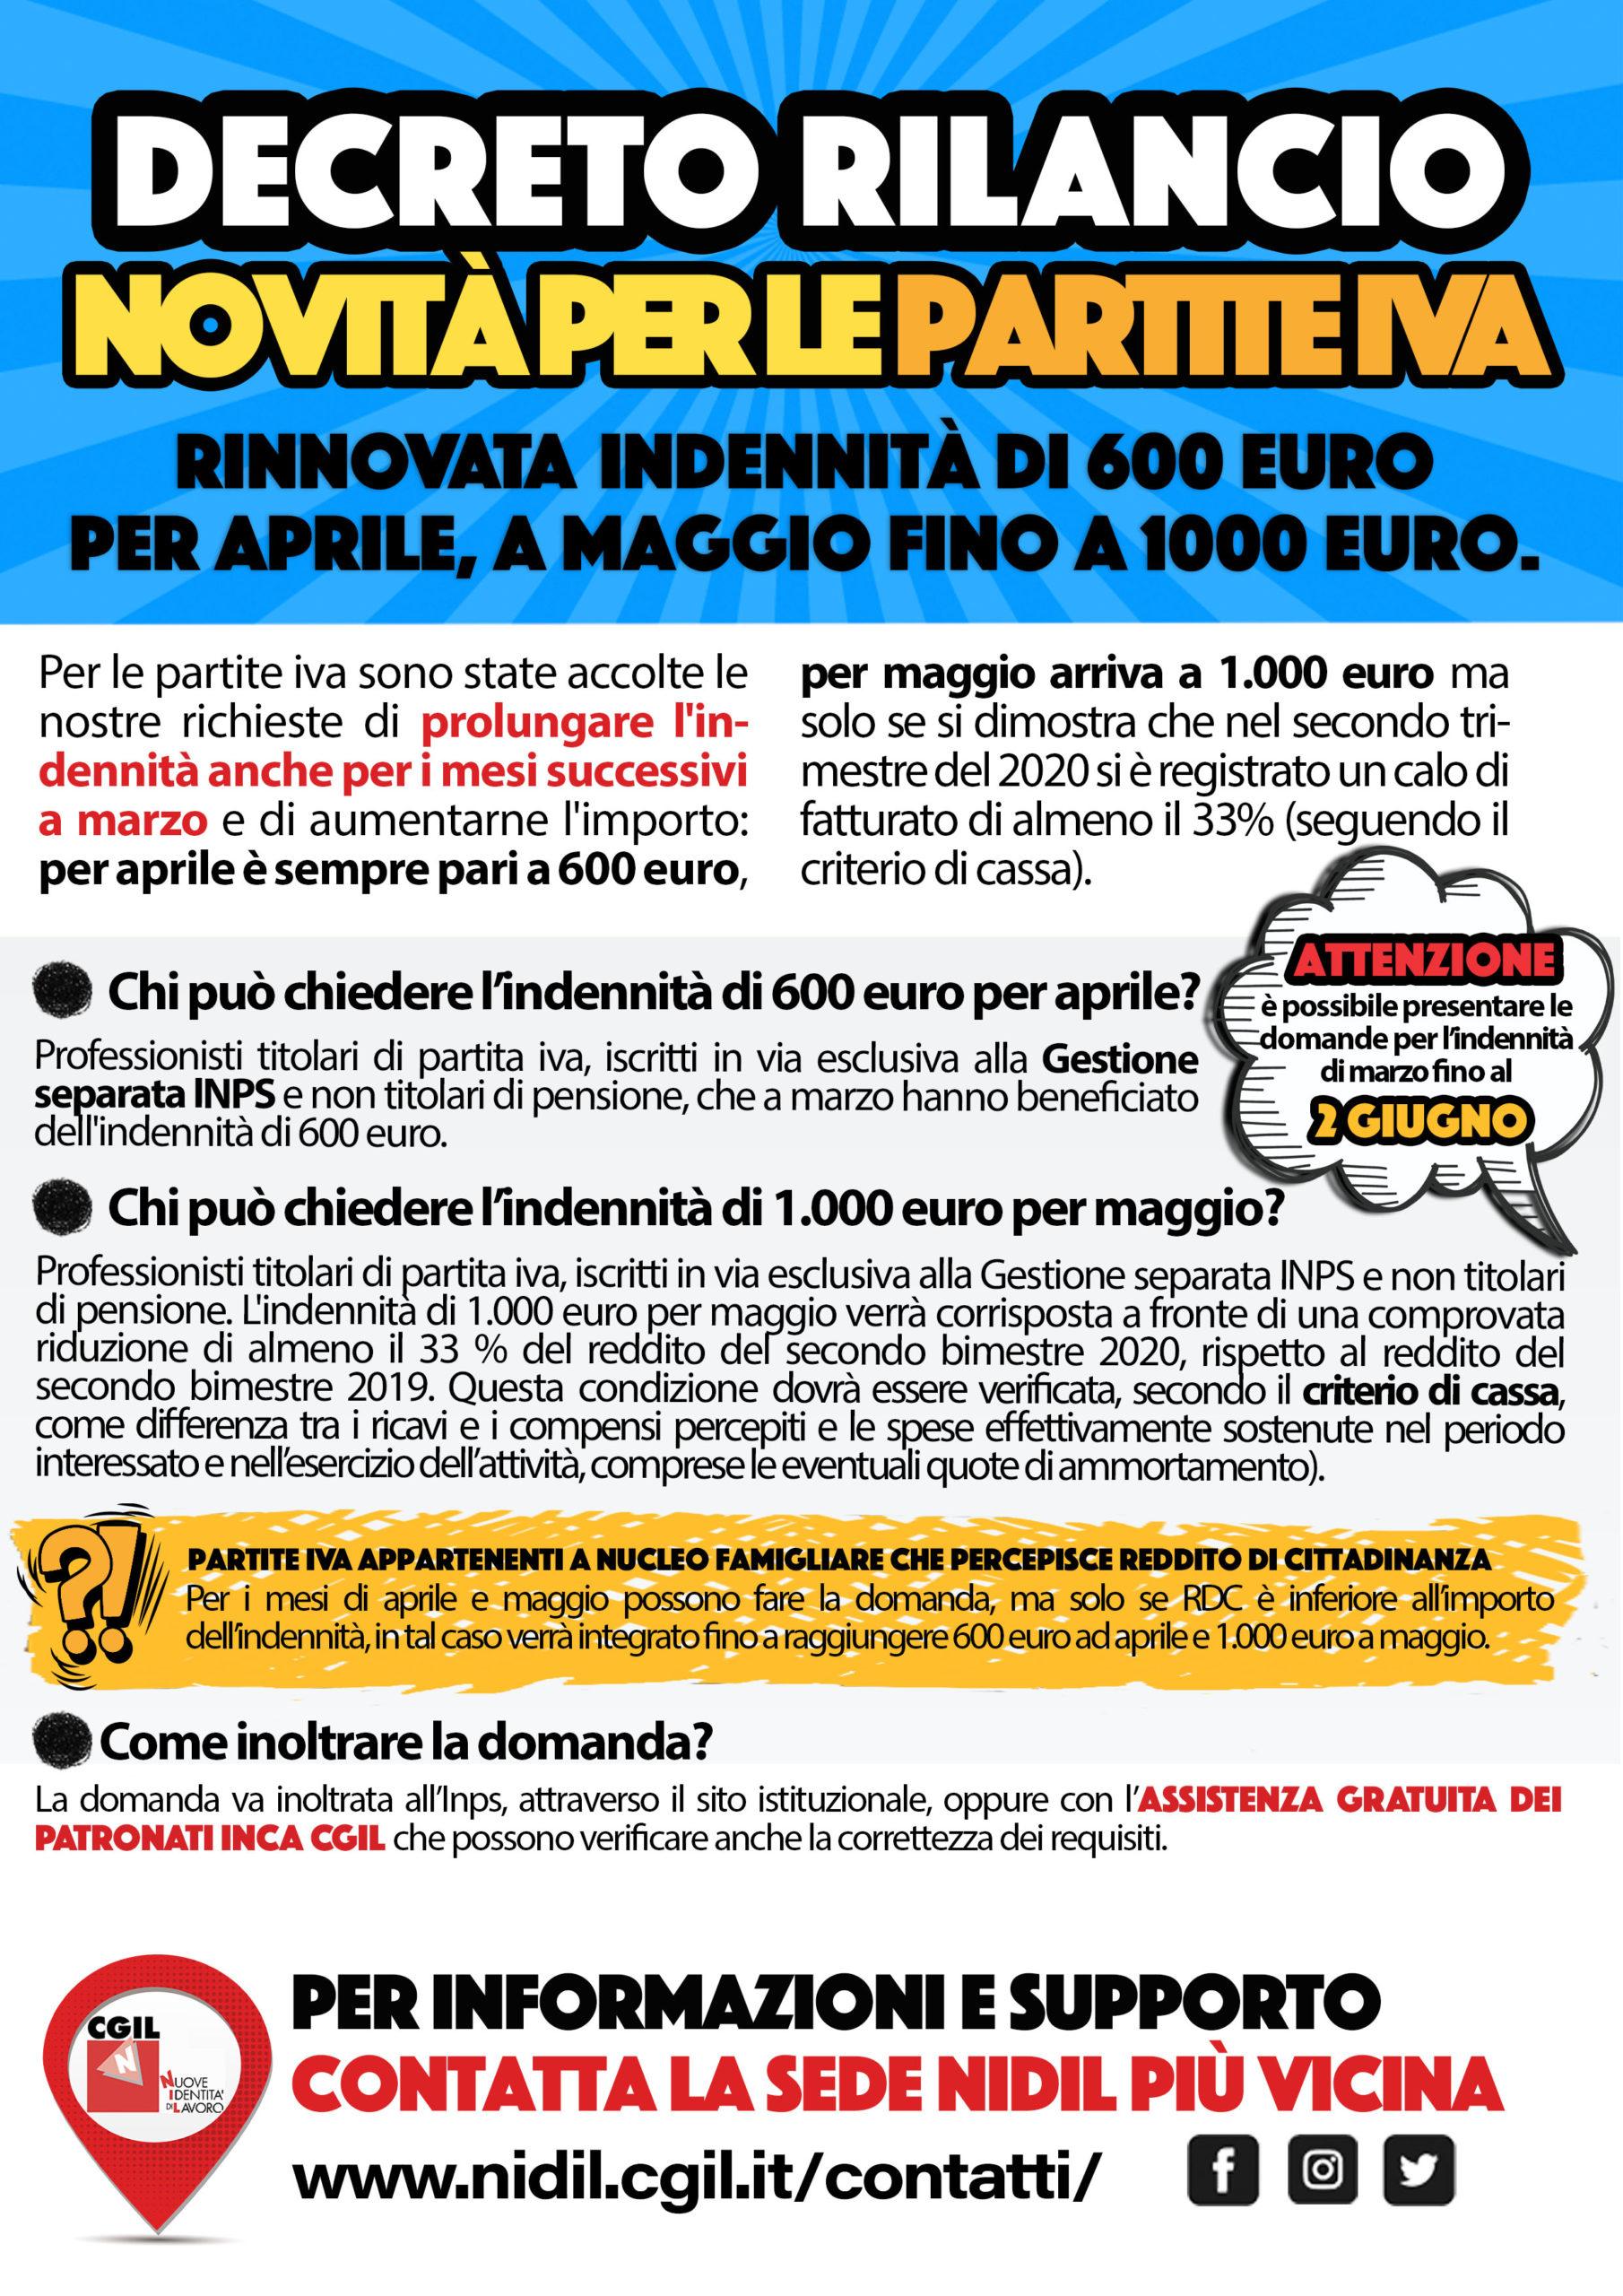 Decreto Rilancio Partite IVA